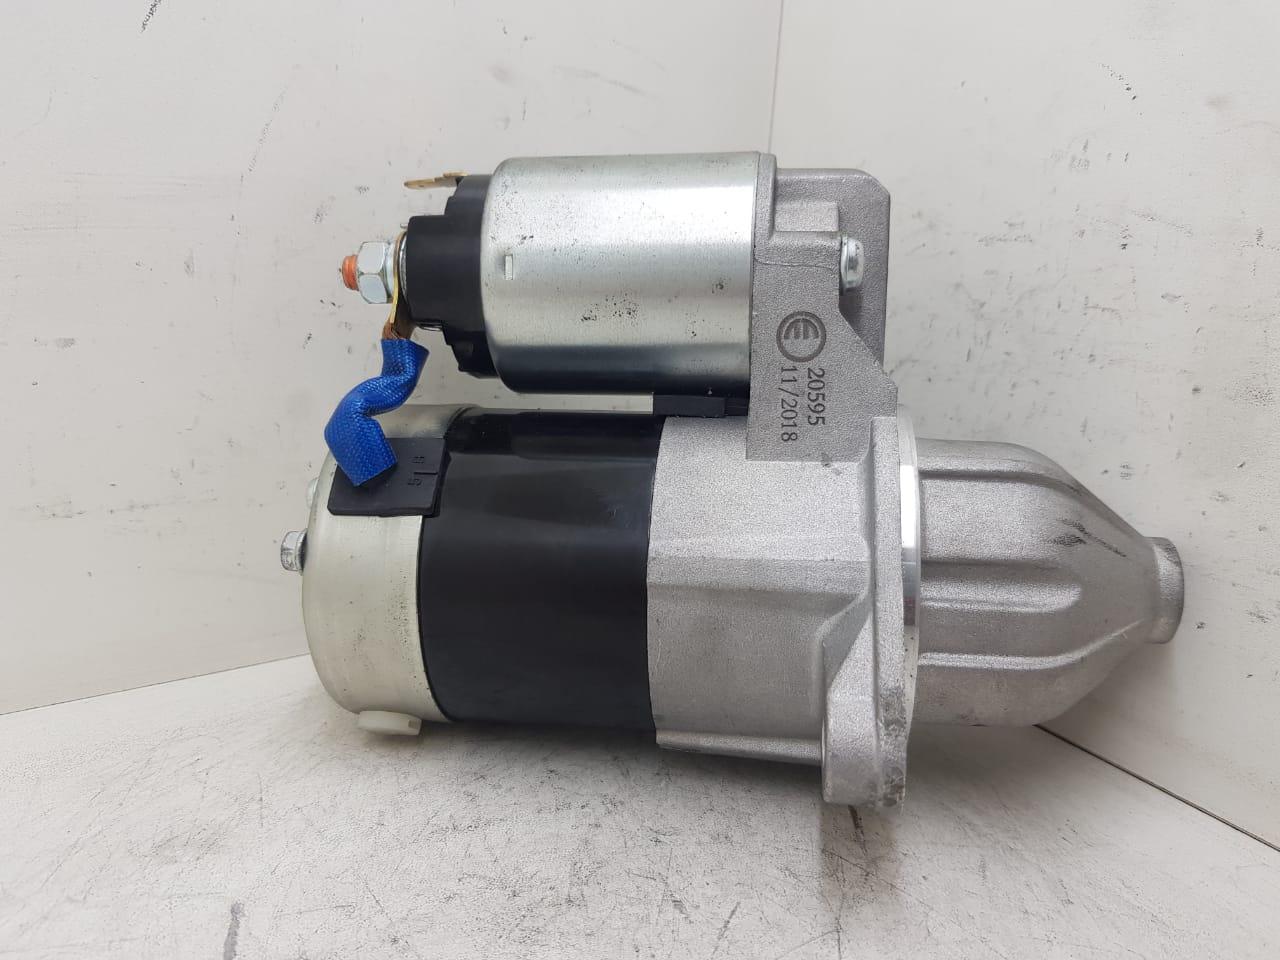 Motor Arranque Partida Jac J2 J3 1.4 16v E J5 1.5 16v 10D T208 1043100GG010 QDY1289